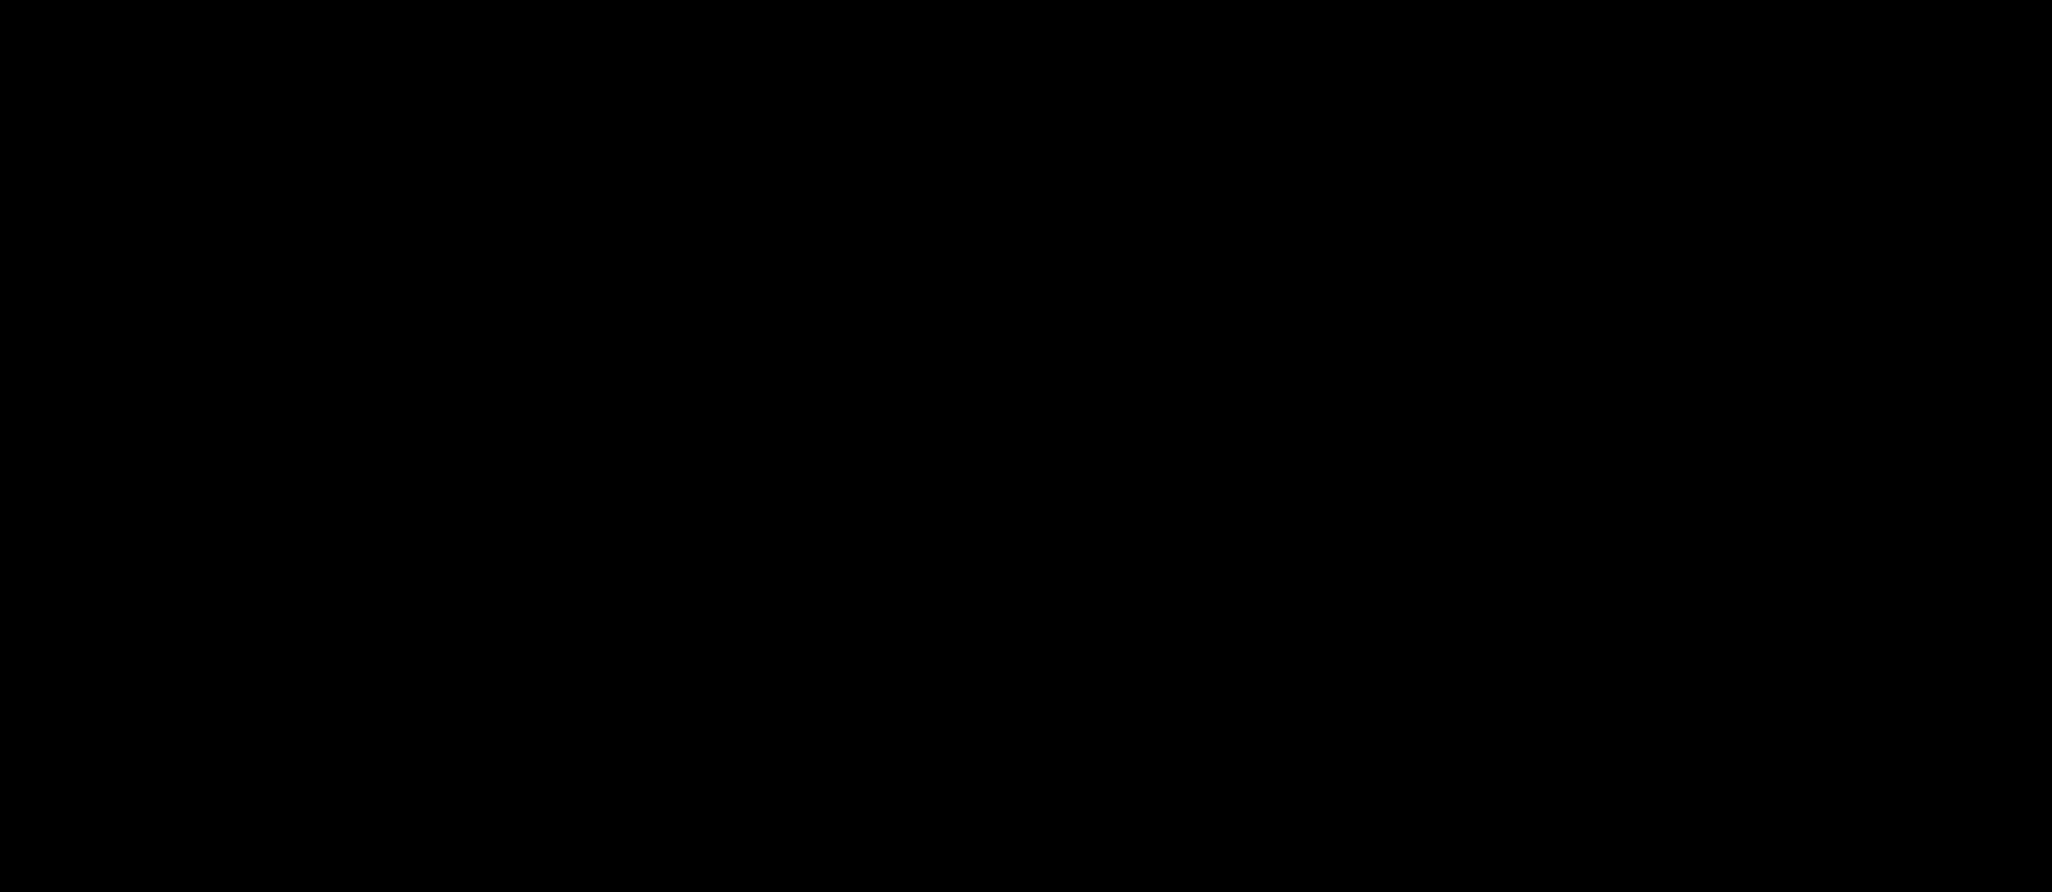 Azadibenzocyclooctyne-Biotin conjugate